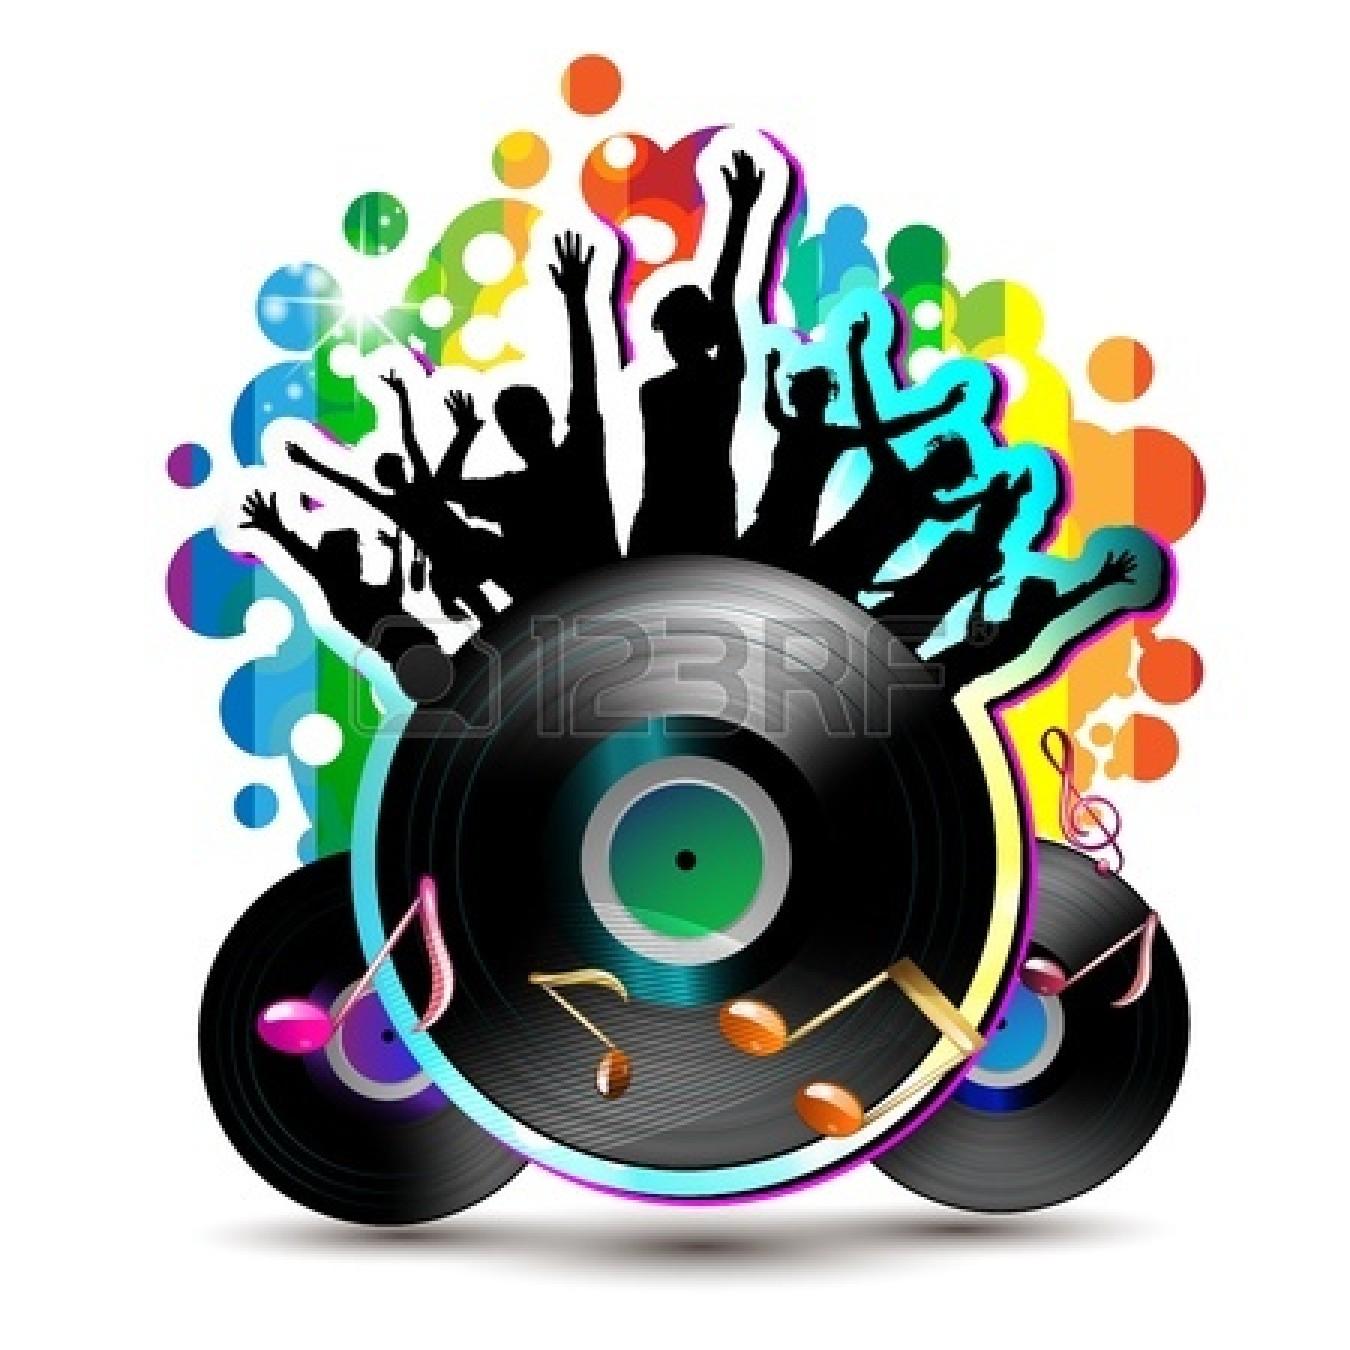 Dance party background clipart panda free clipart images - Bola de discoteca ...